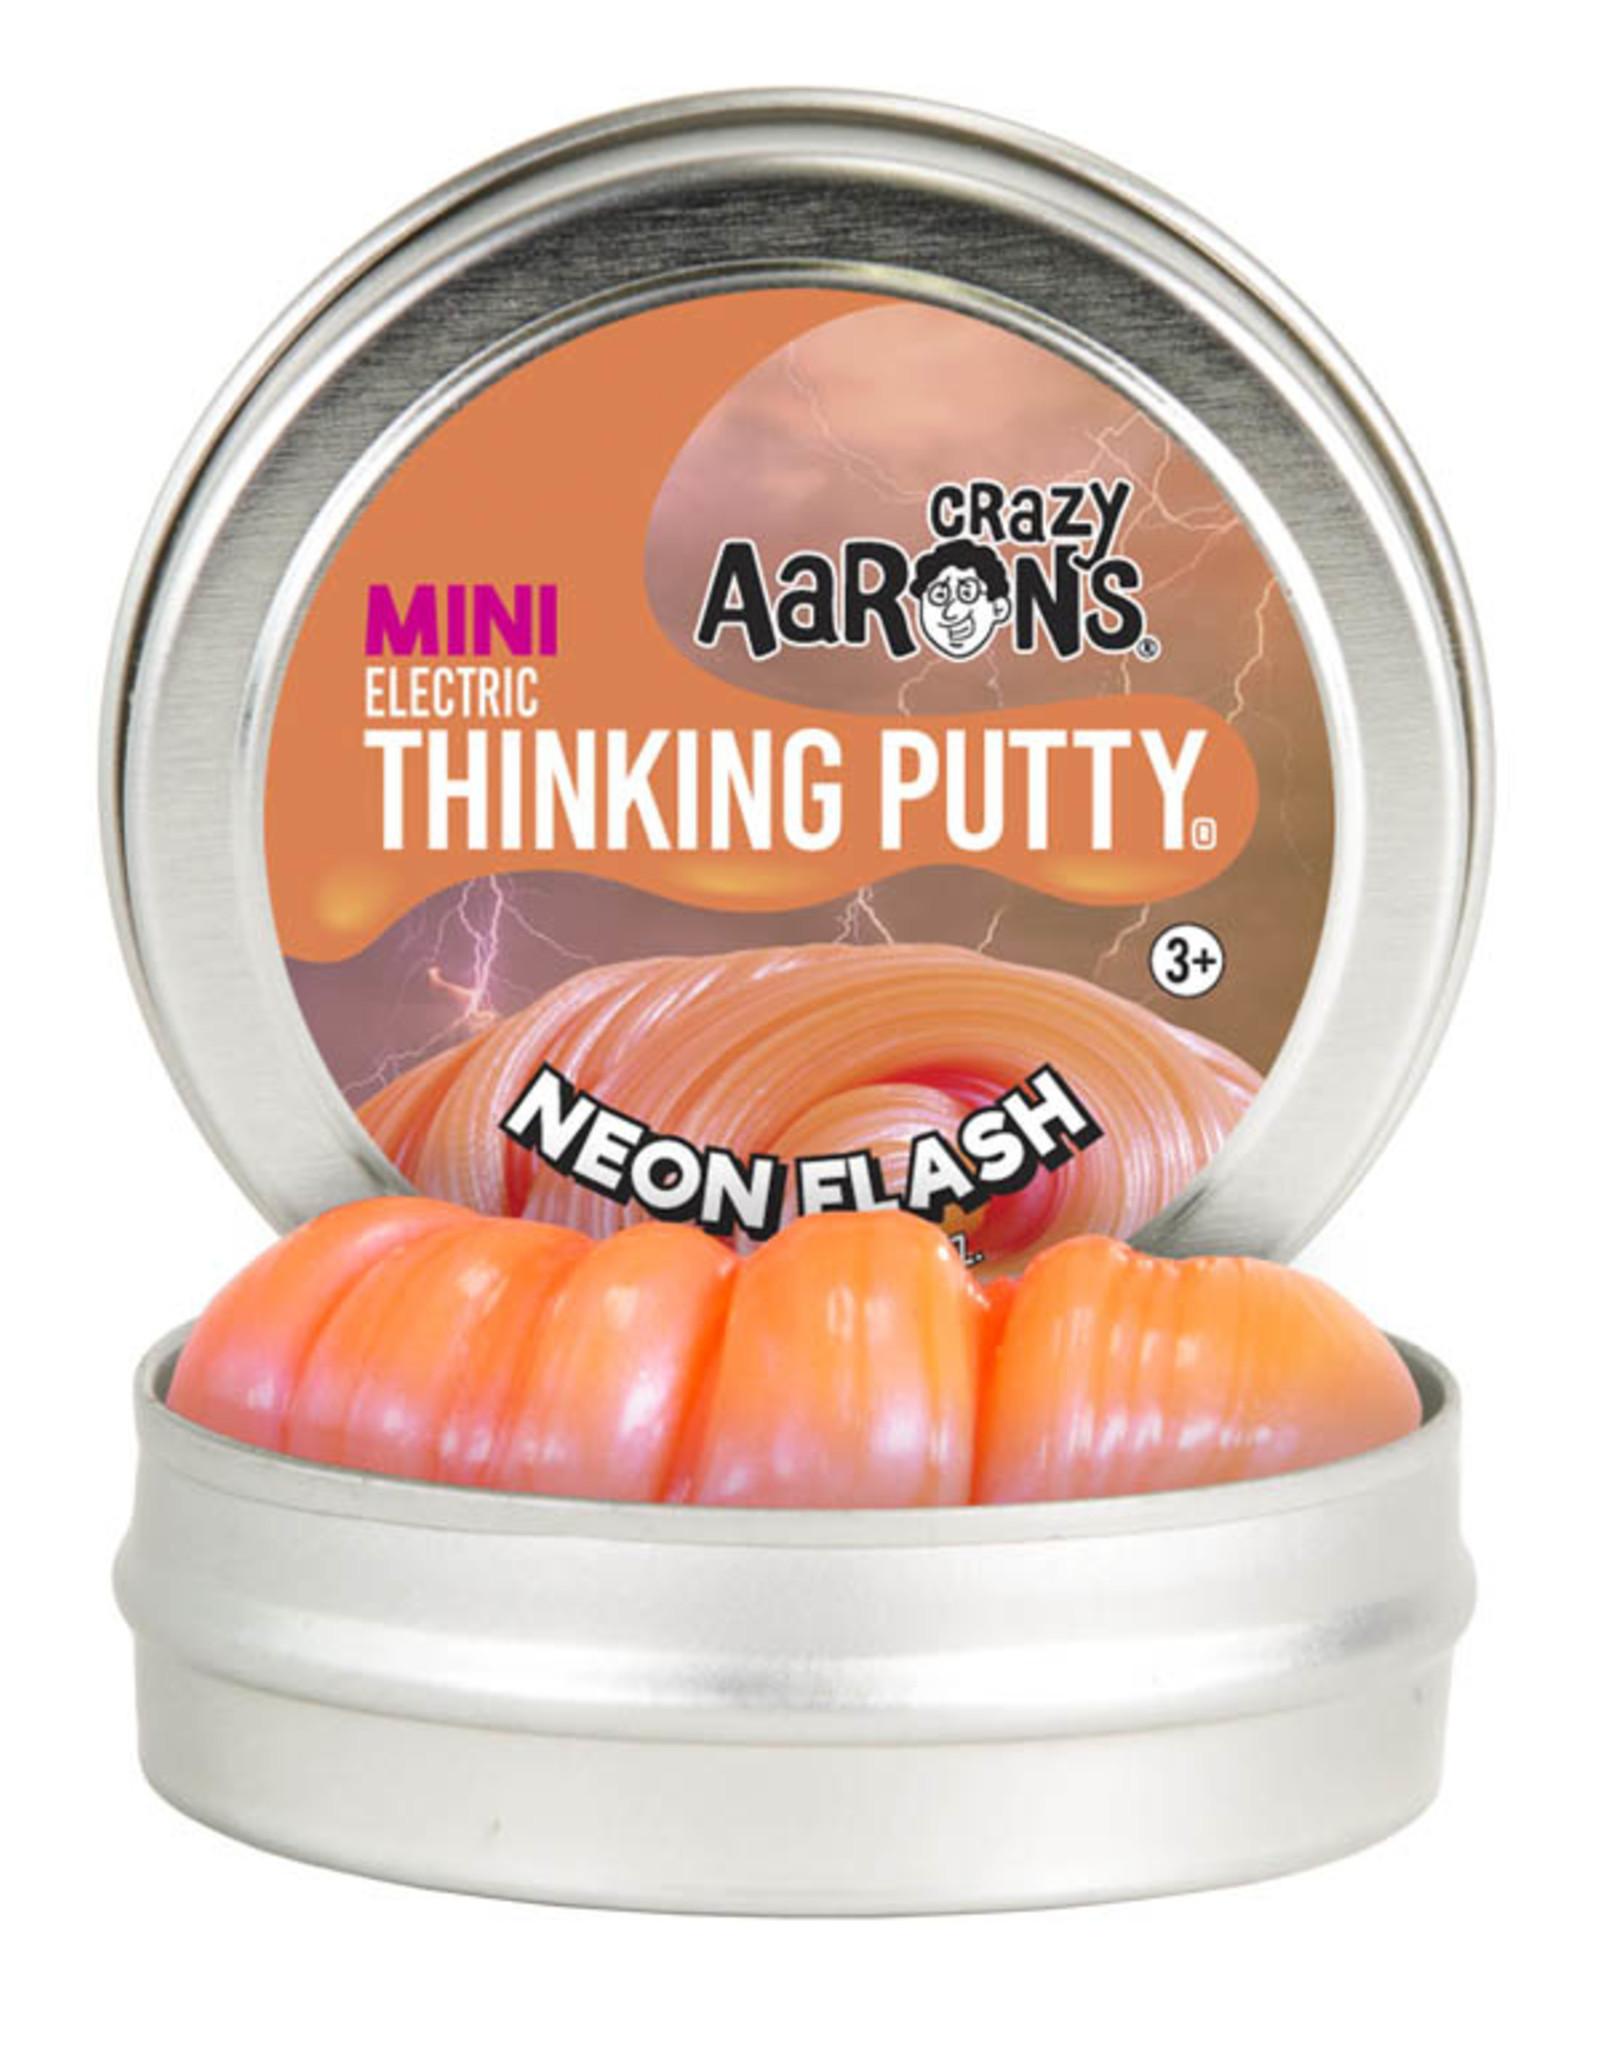 Crazy Aaron's Thinking Putty Crazy Aaron's Mini Tin -  Neon Flash (Electric)